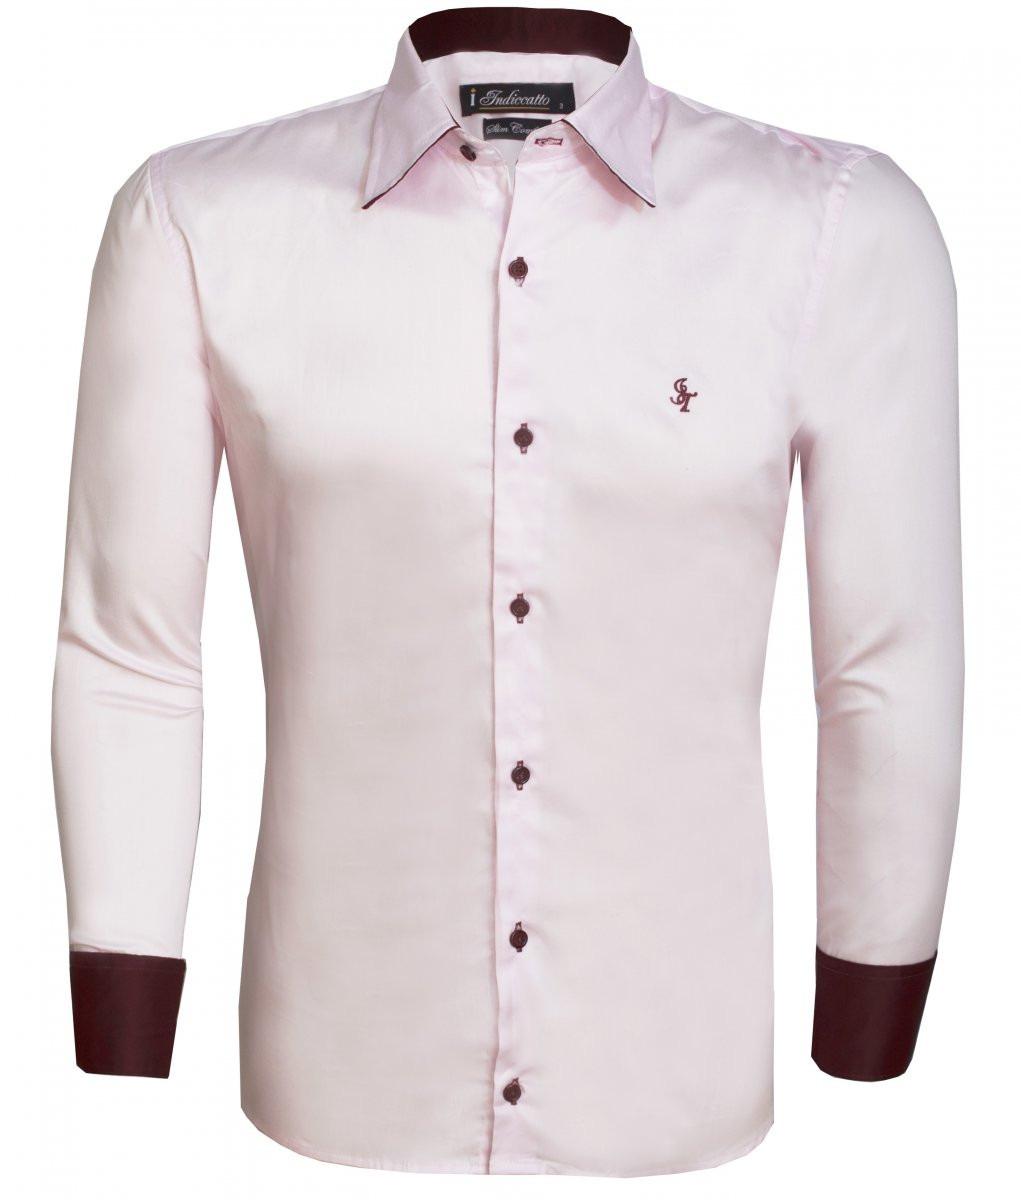 c58789bc5c Camisa Social Masculina Rosa Claro - R$ 35,00 em Mercado Livre